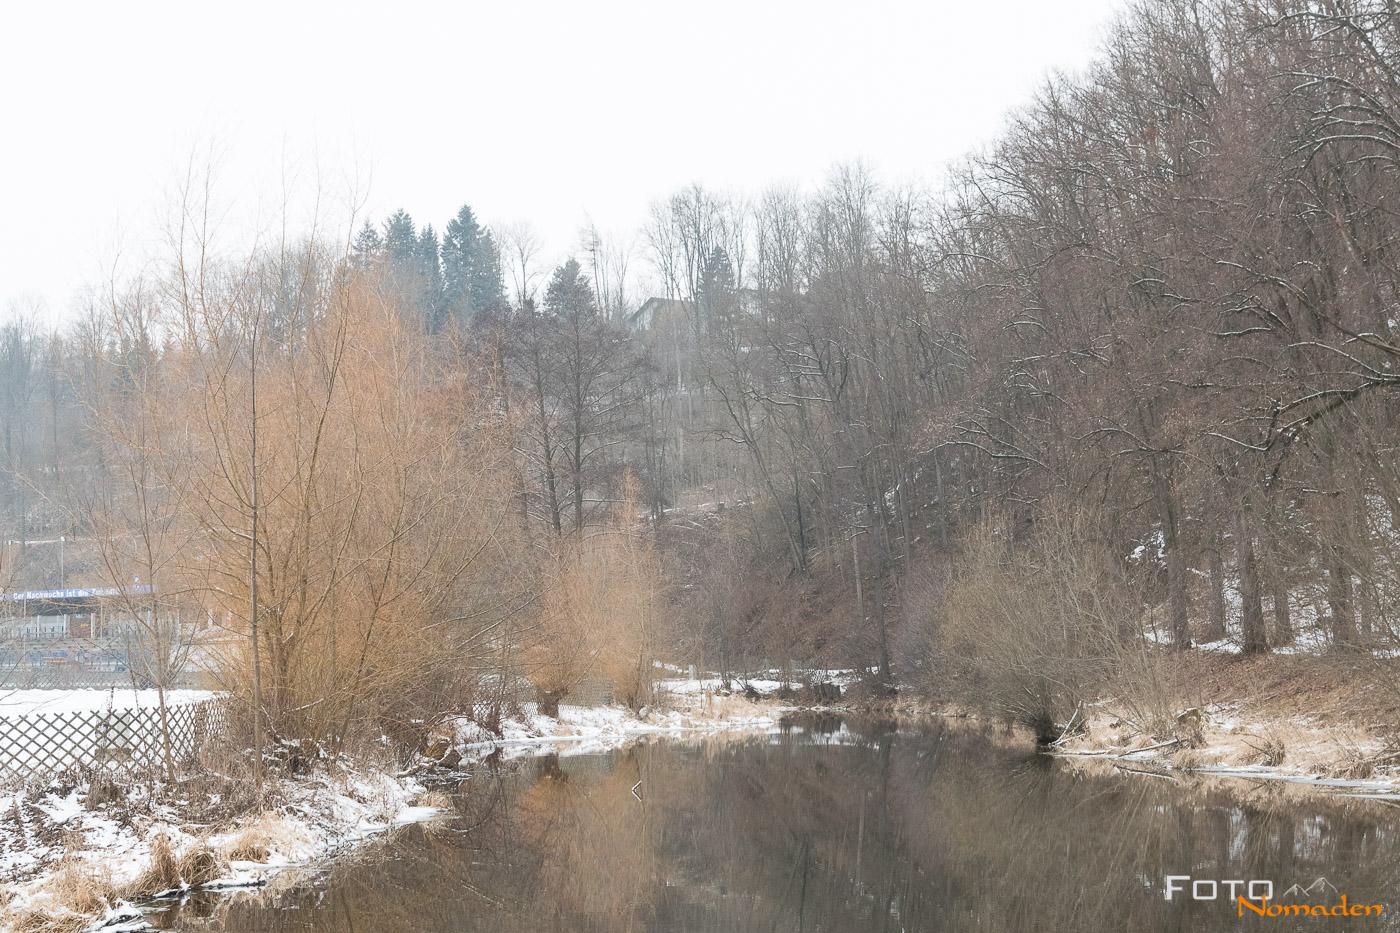 Fotonomaden Winterbilder Fehler